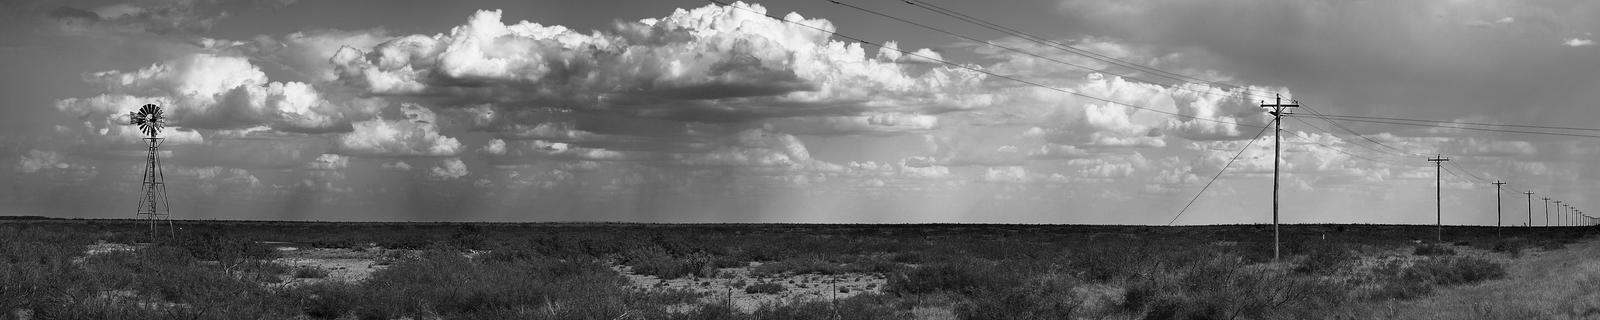 New Mexico Windmill by hellsbella